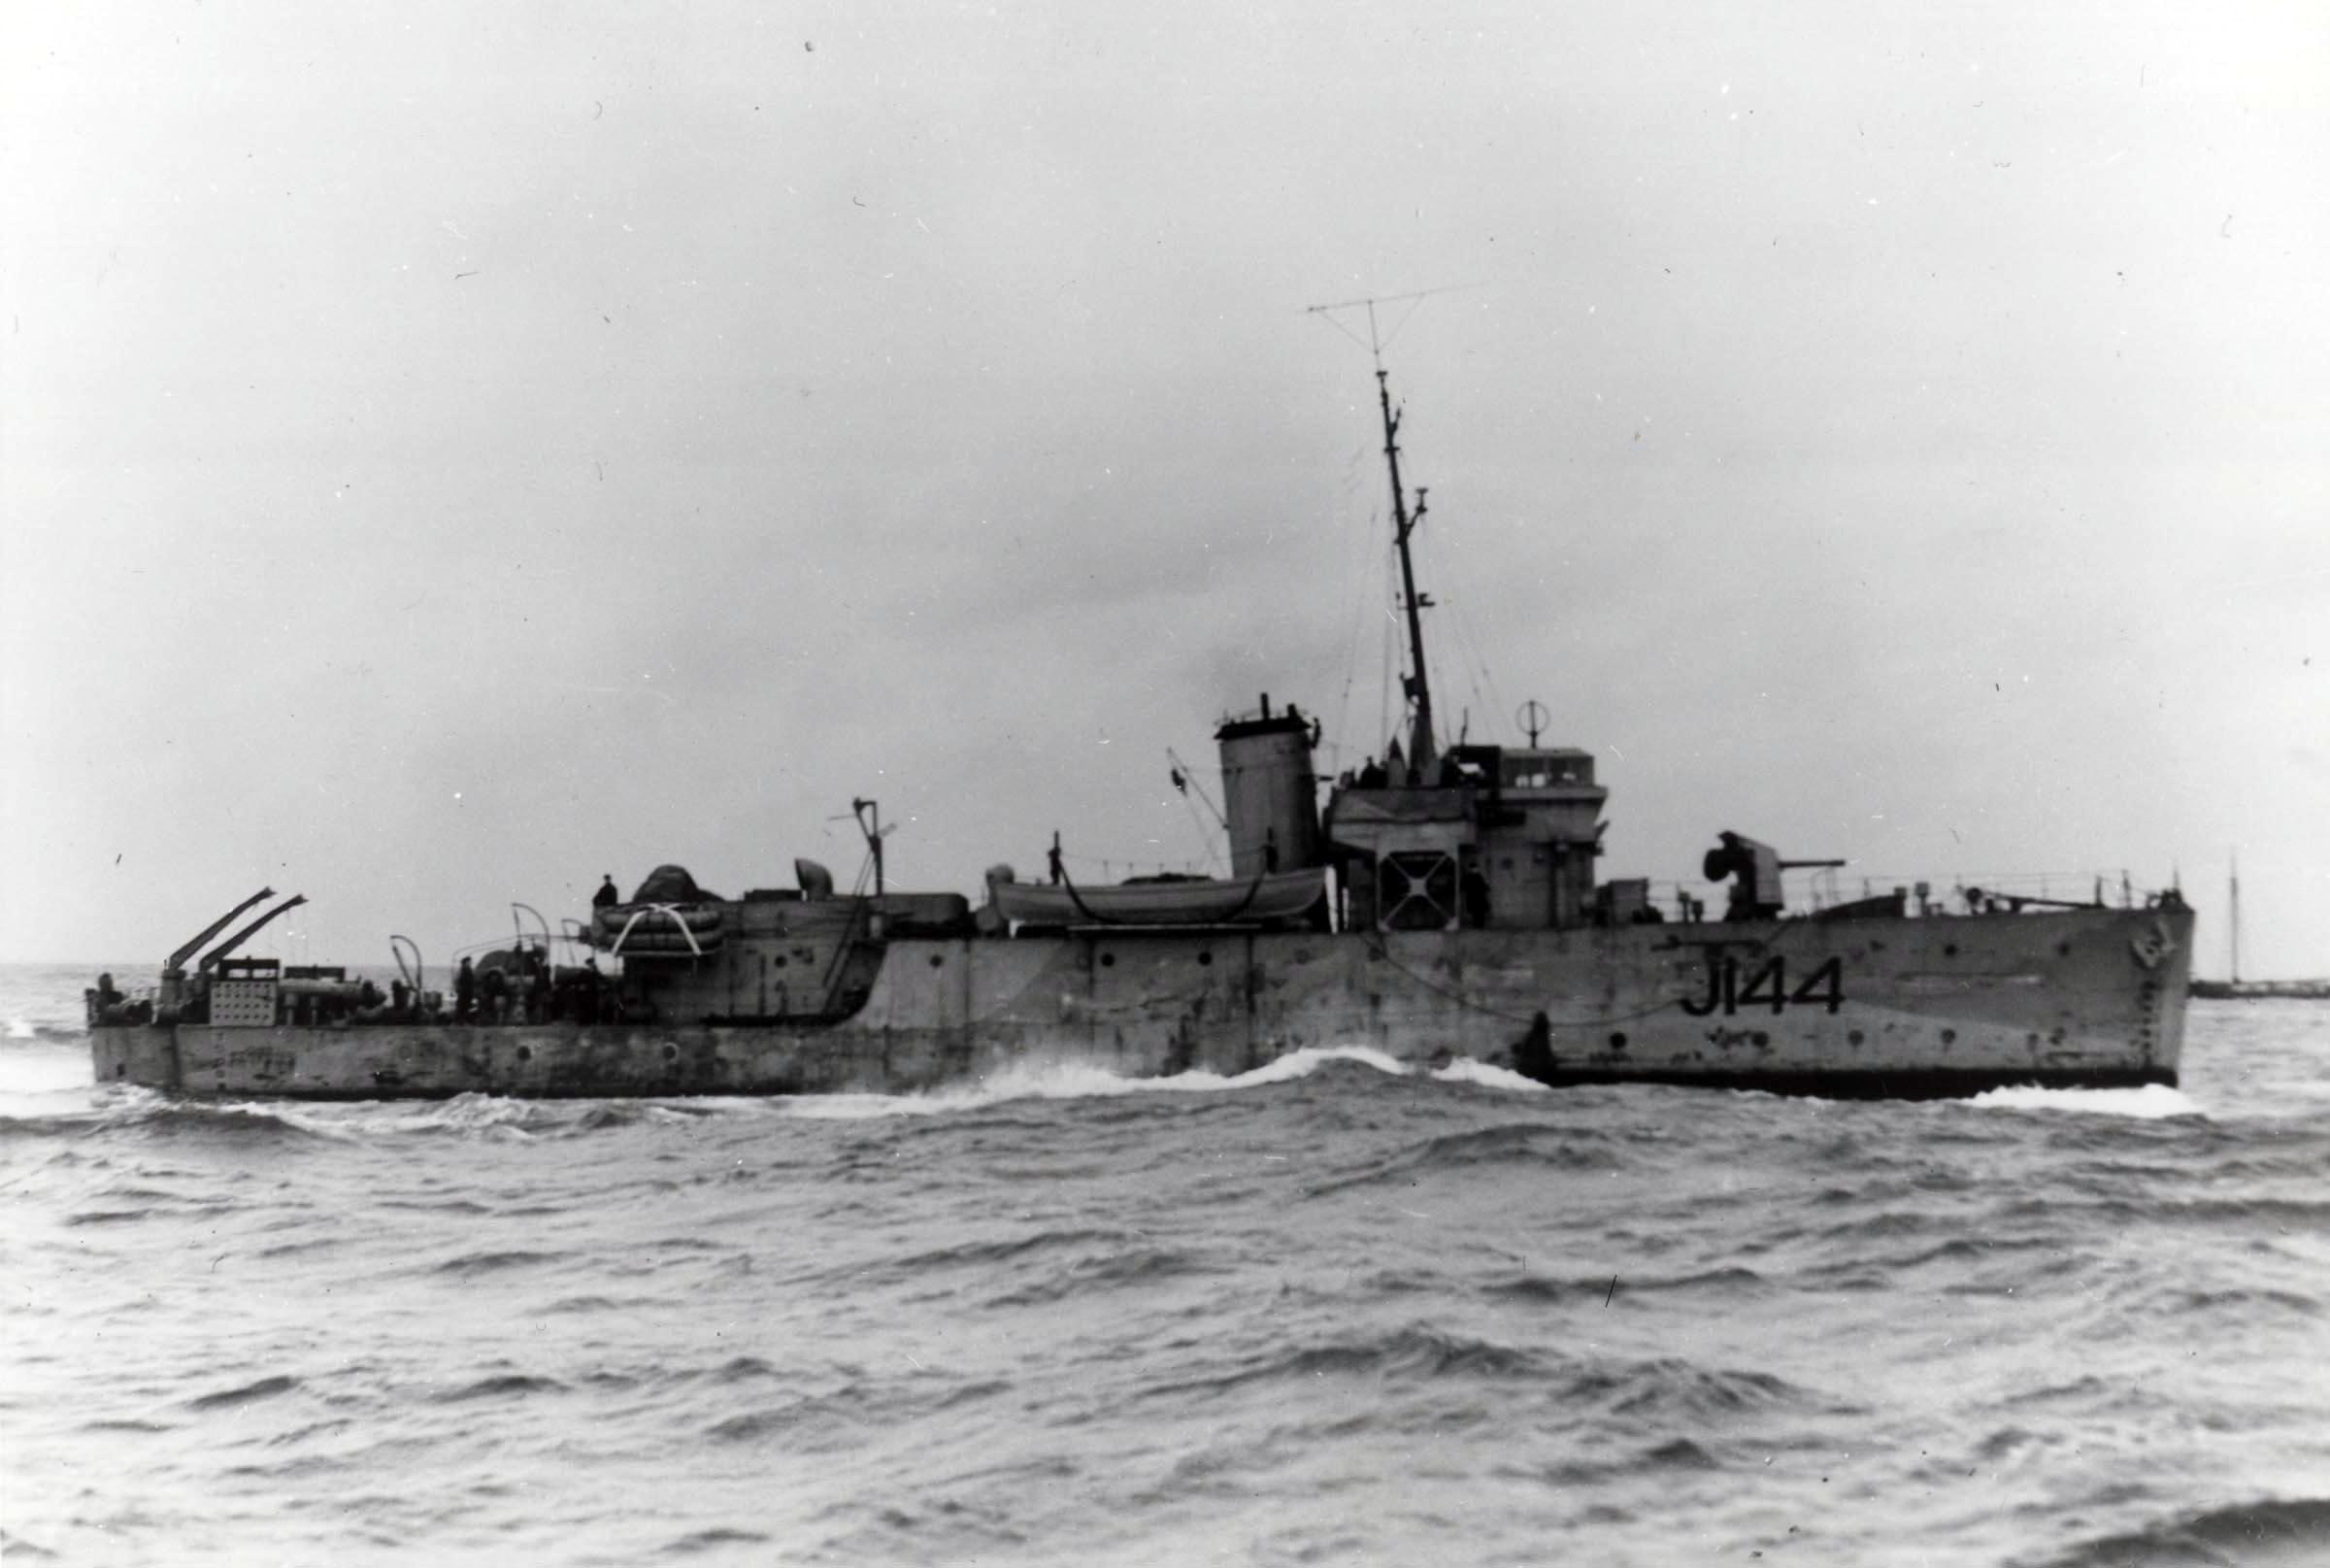 HMCS GEORGIAN